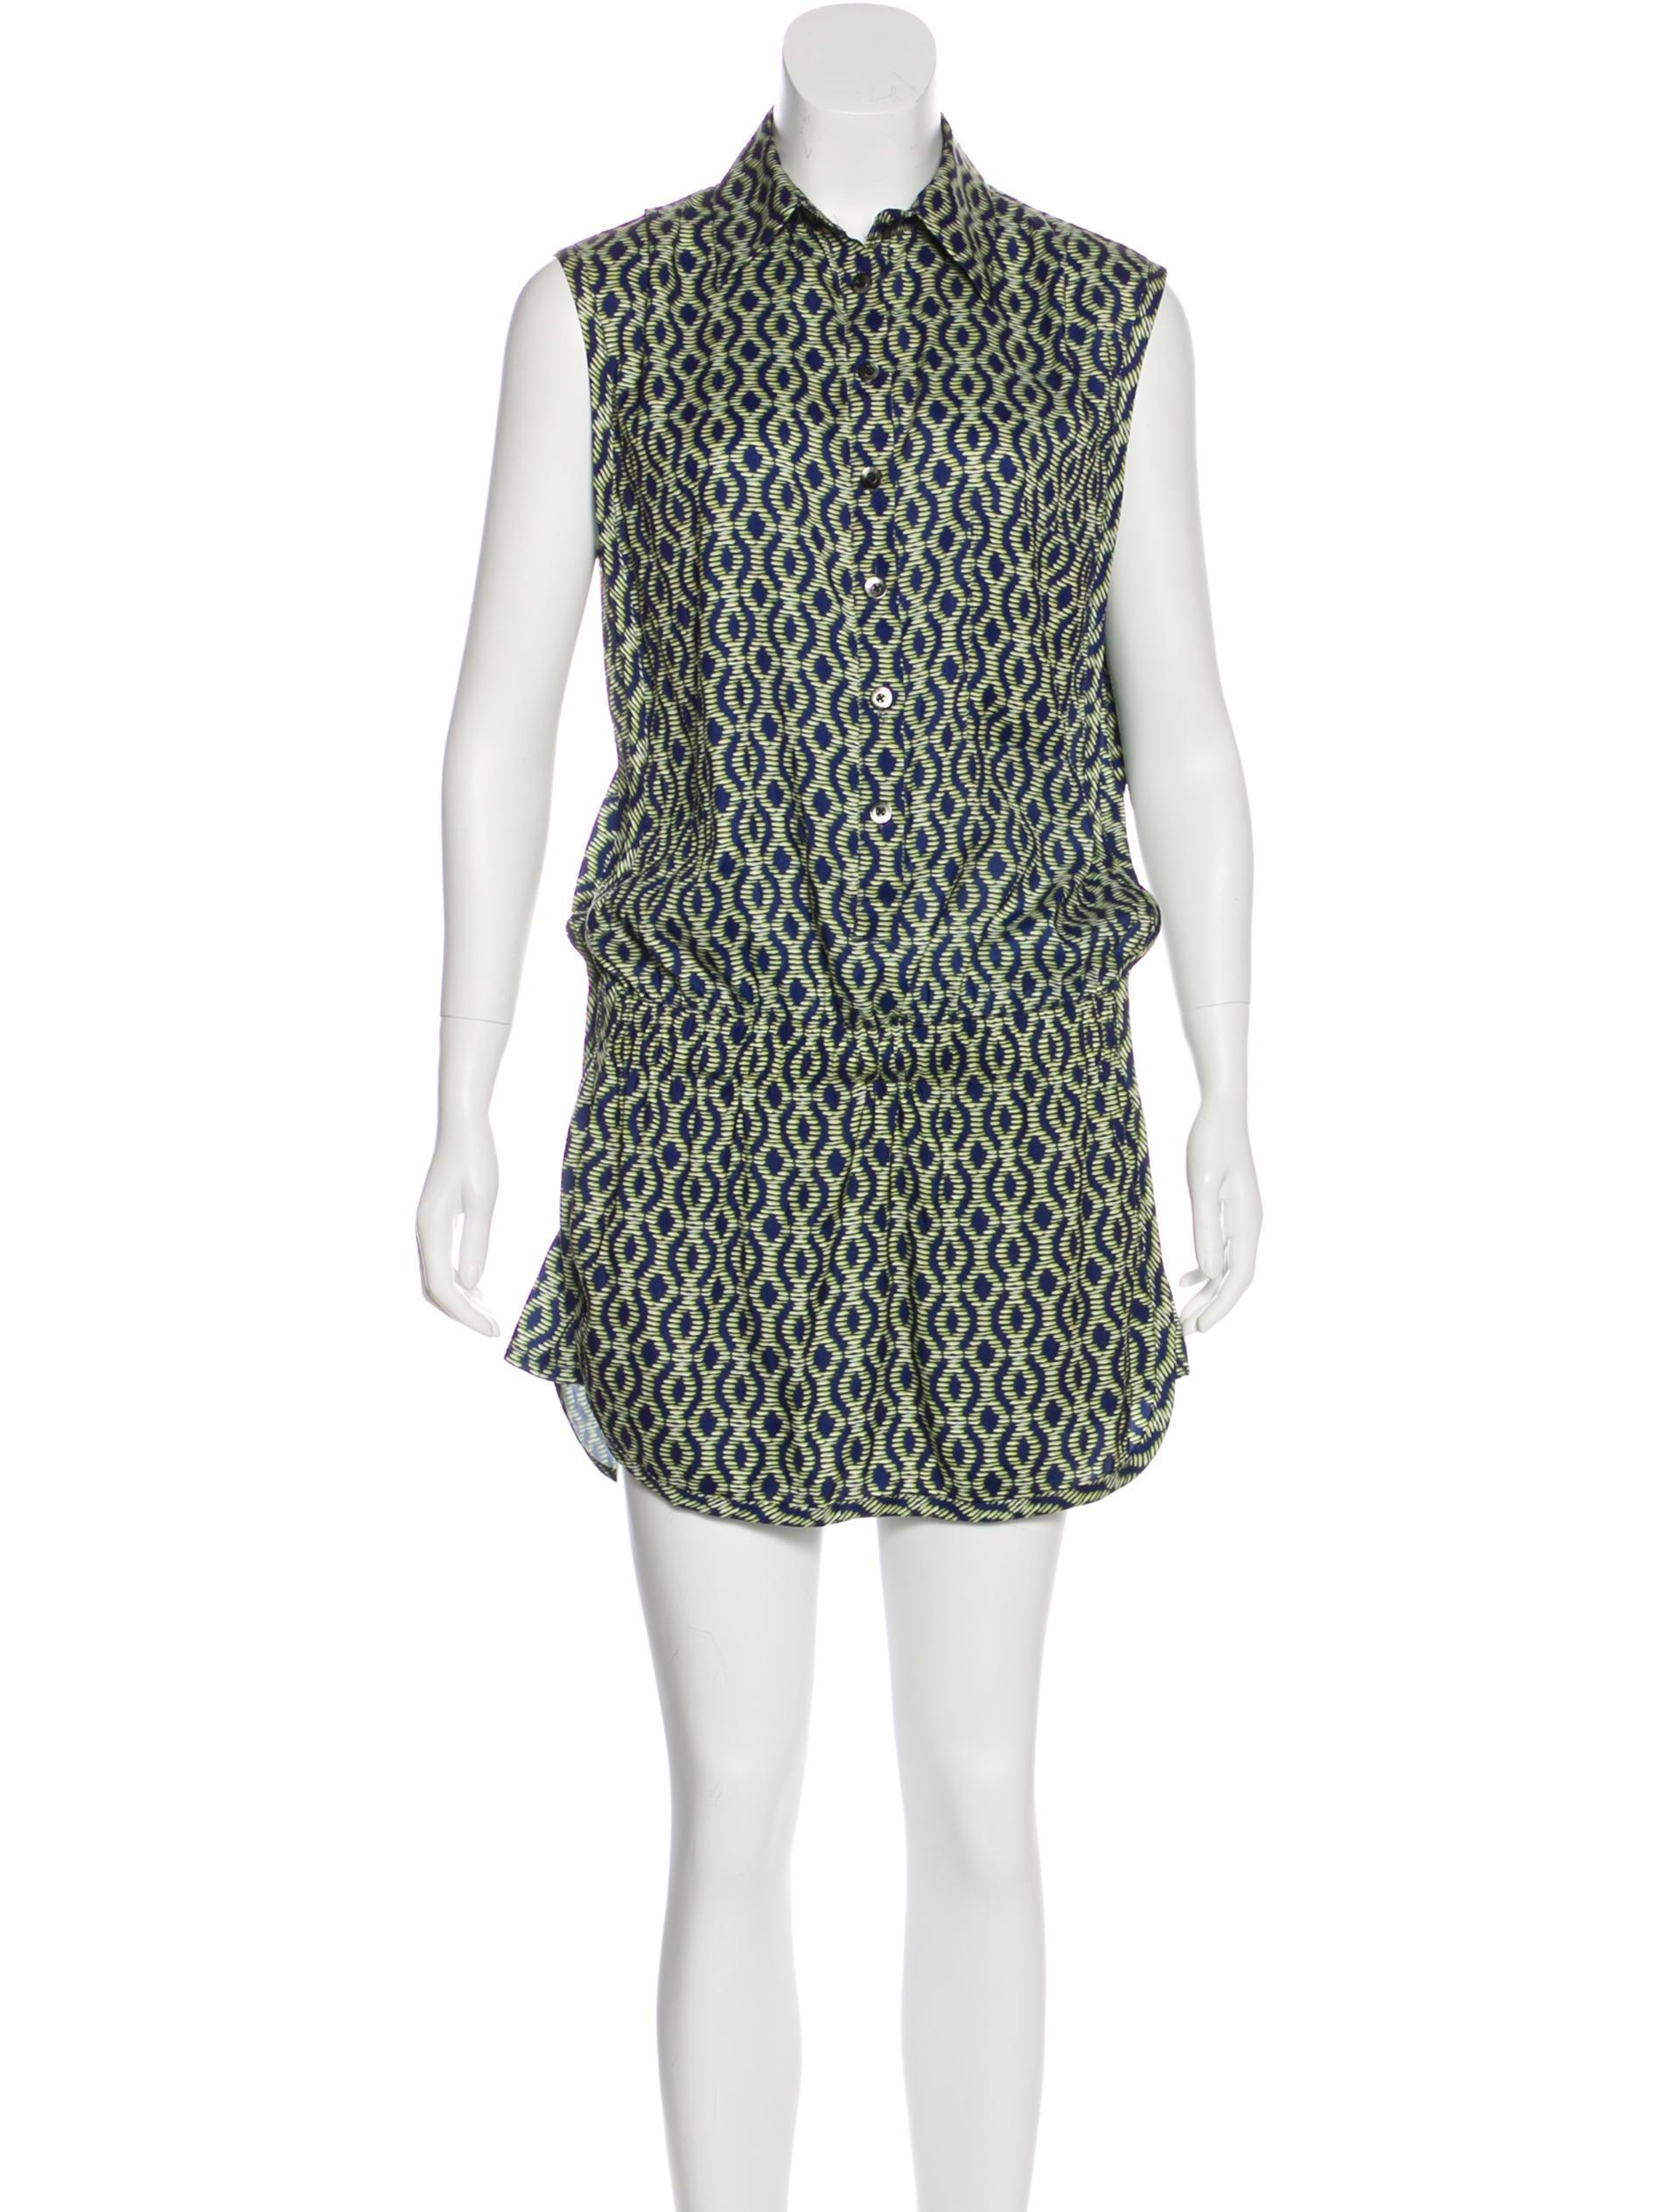 5147a5cd8b01 Thakoon Addition Printed Sleeveless Romper - Clothing - WTK24034 ...